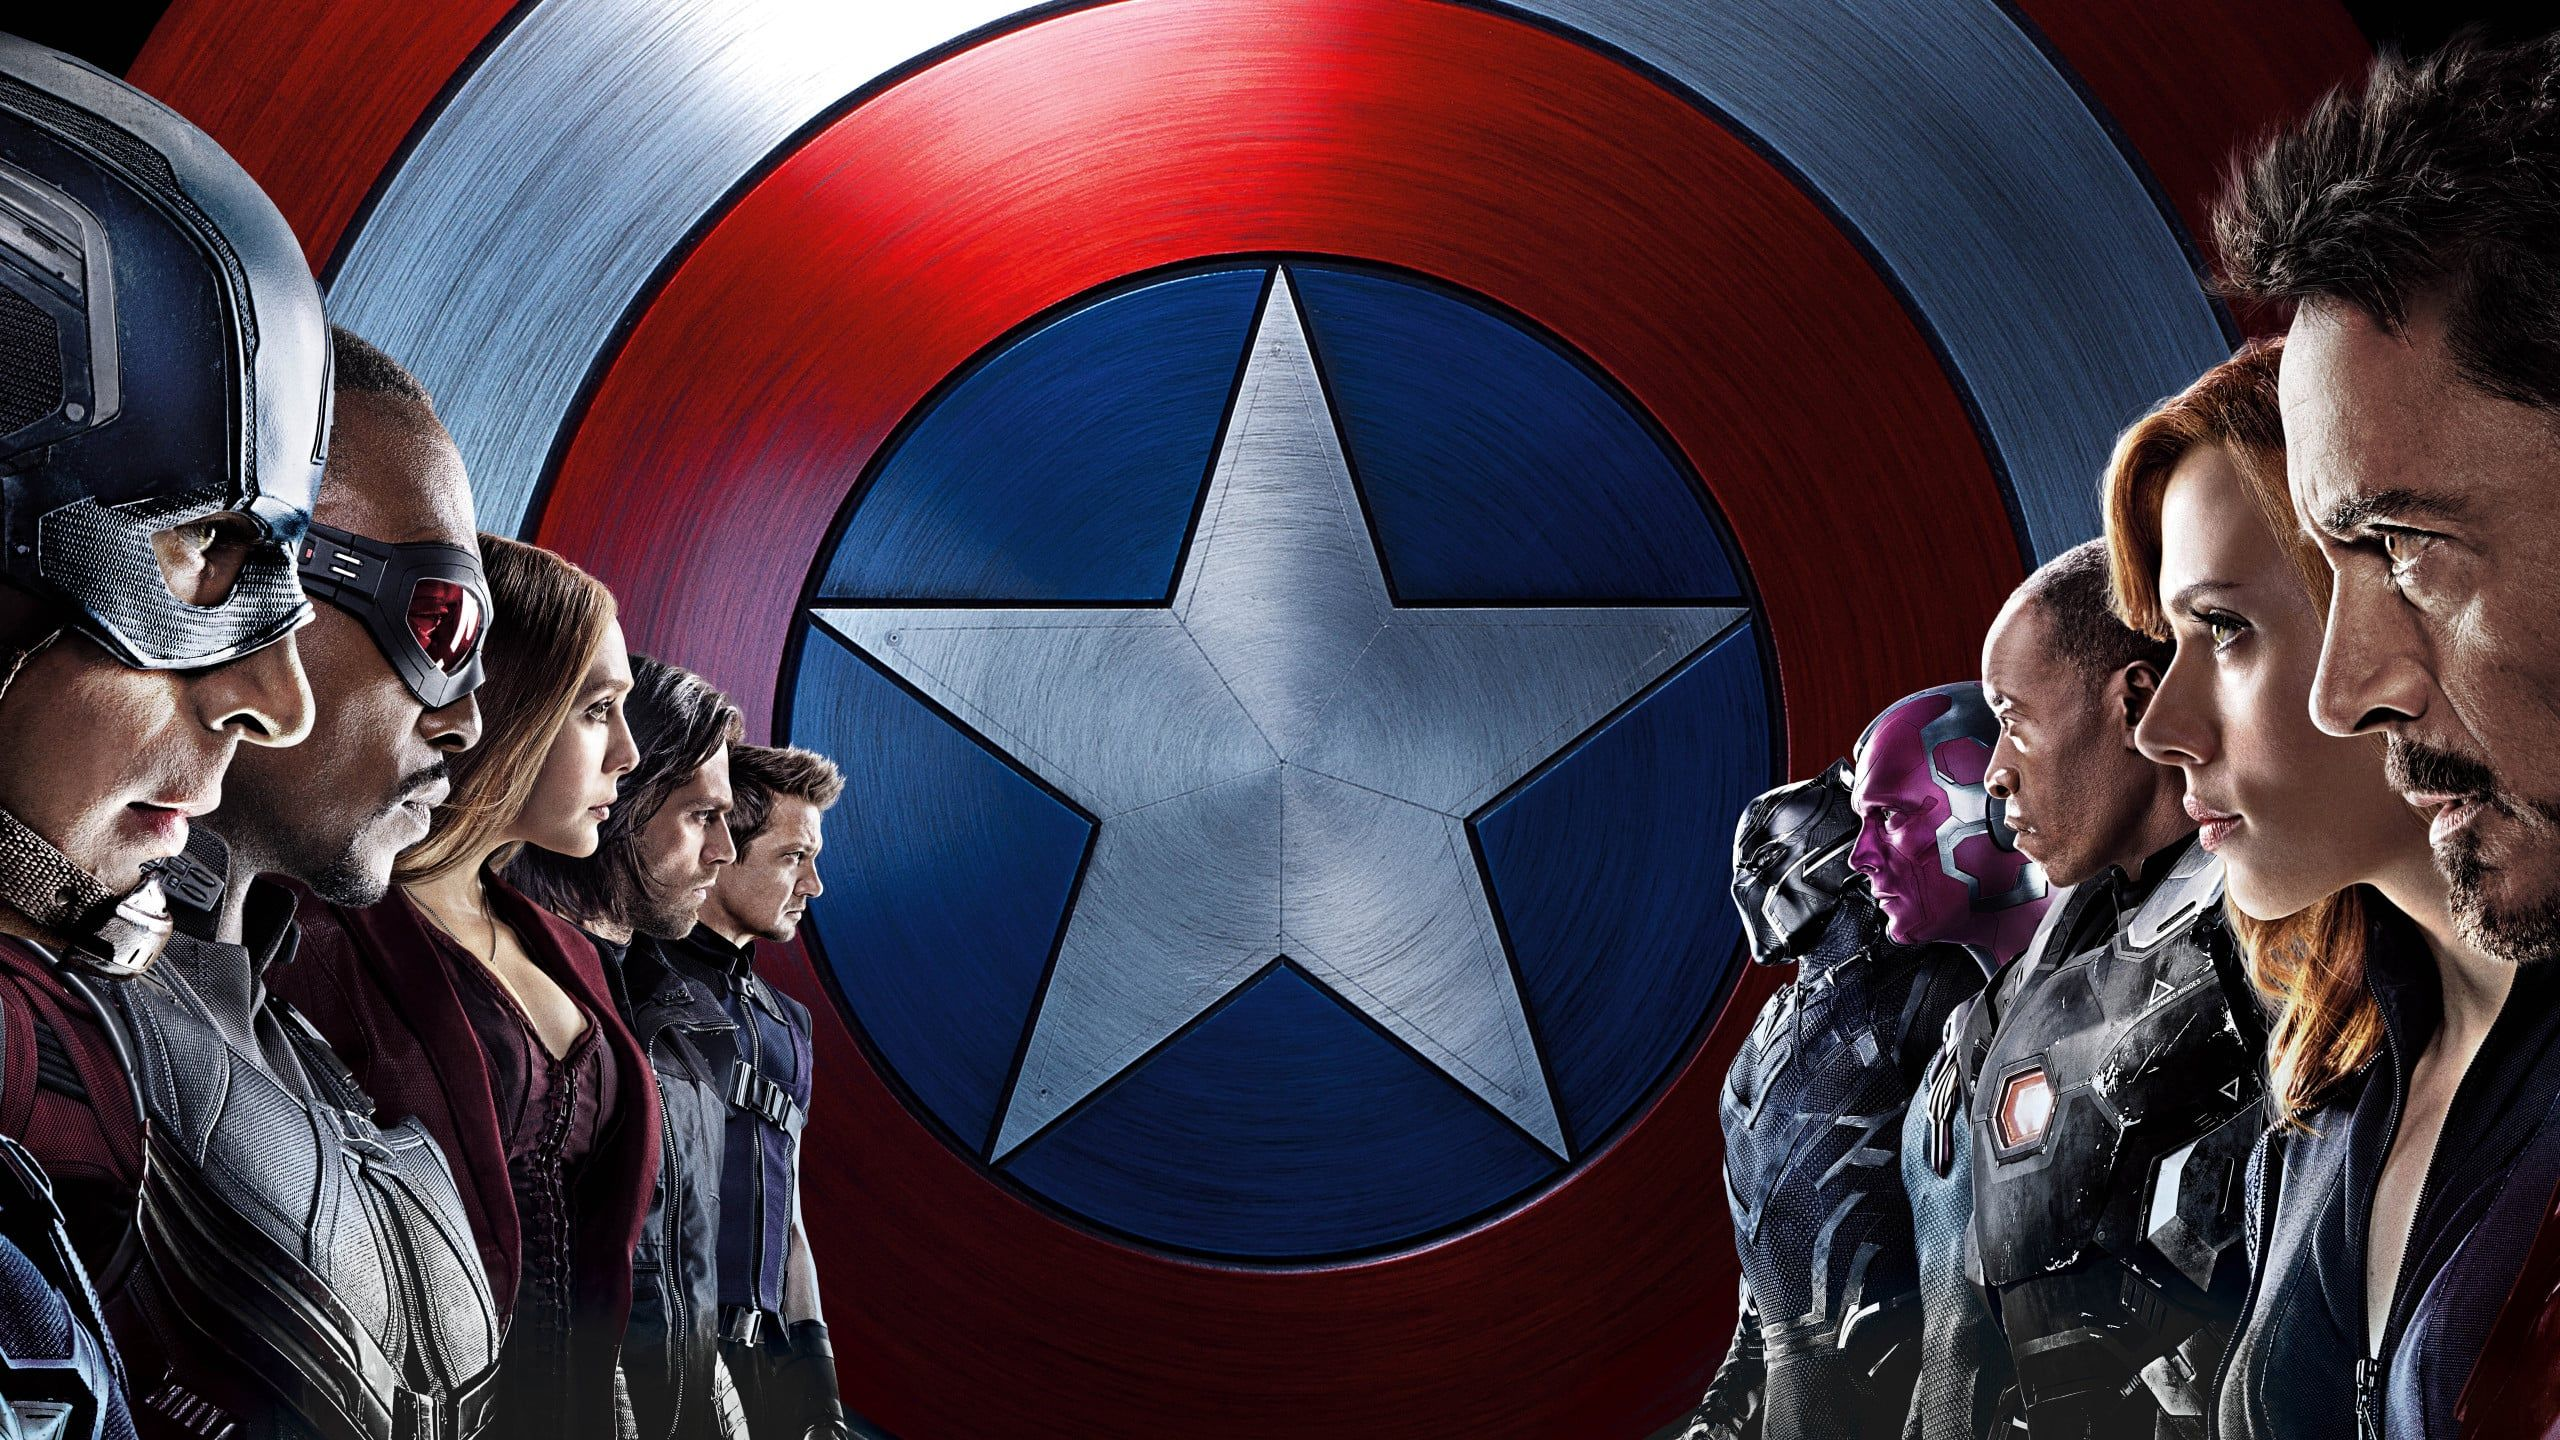 captain america hd desktop wallpapers for | wallpapers | pinterest